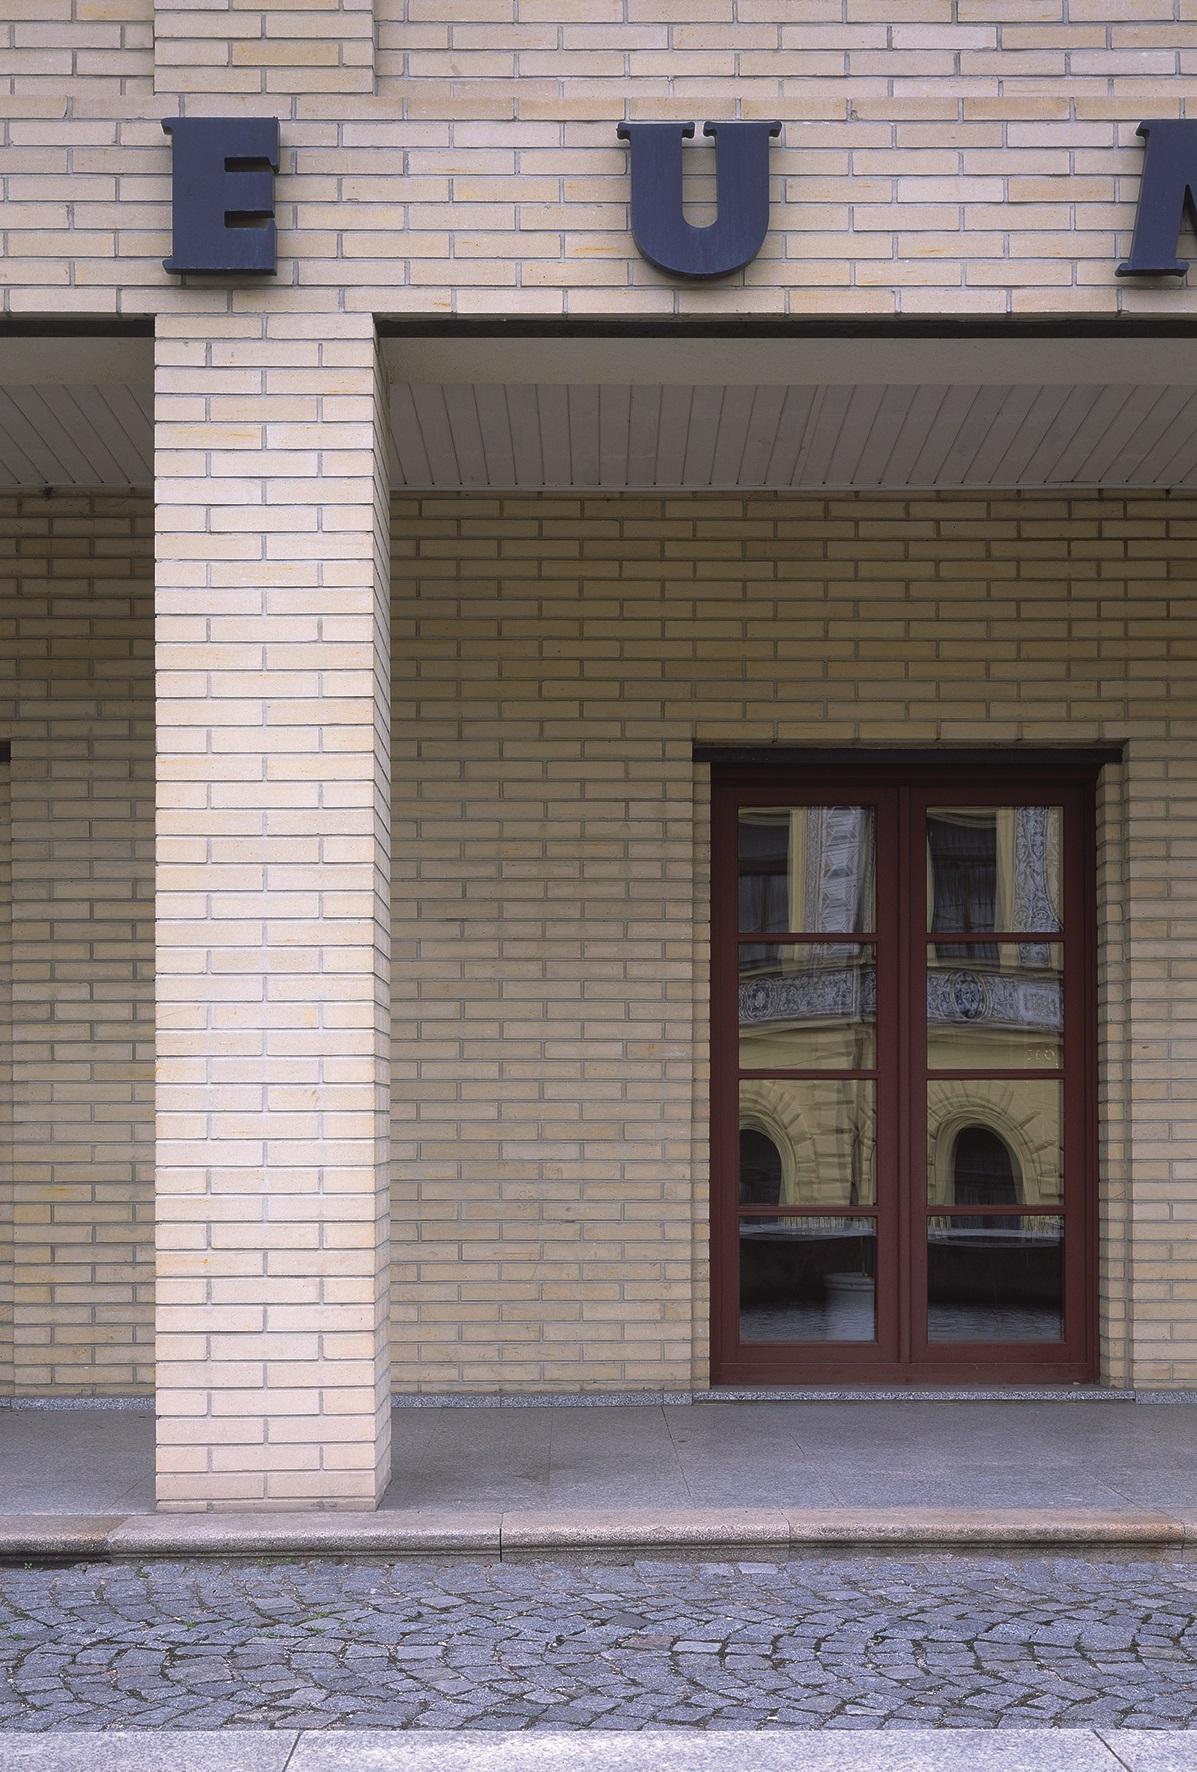 Muzeum polodrahokamů aspiritismu, Nová Paka